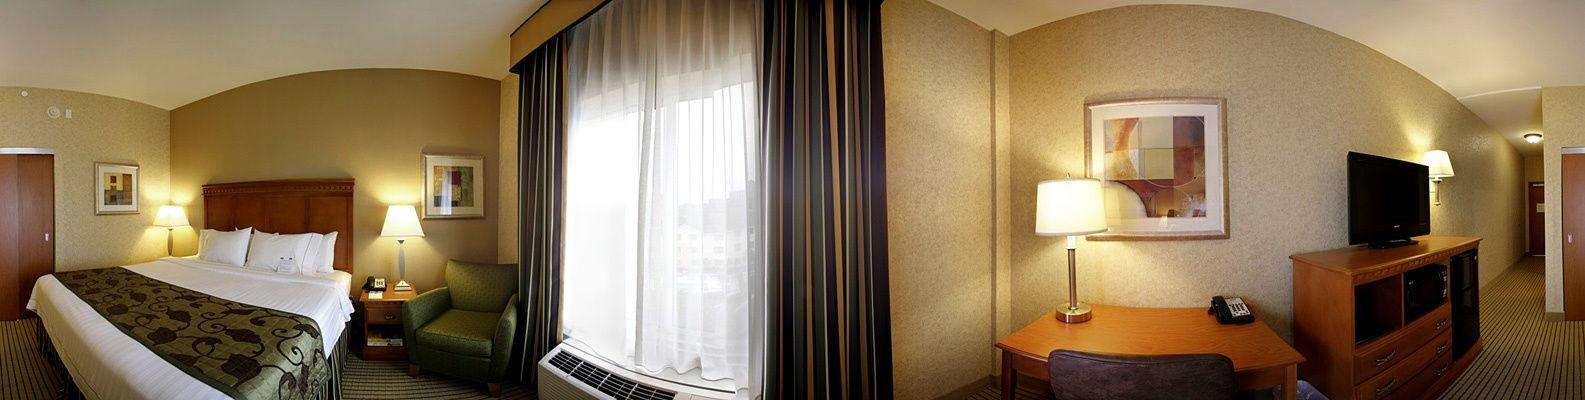 Fairfield Inn & Suites by Marriott Jacksonville Butler Boulevard image 13